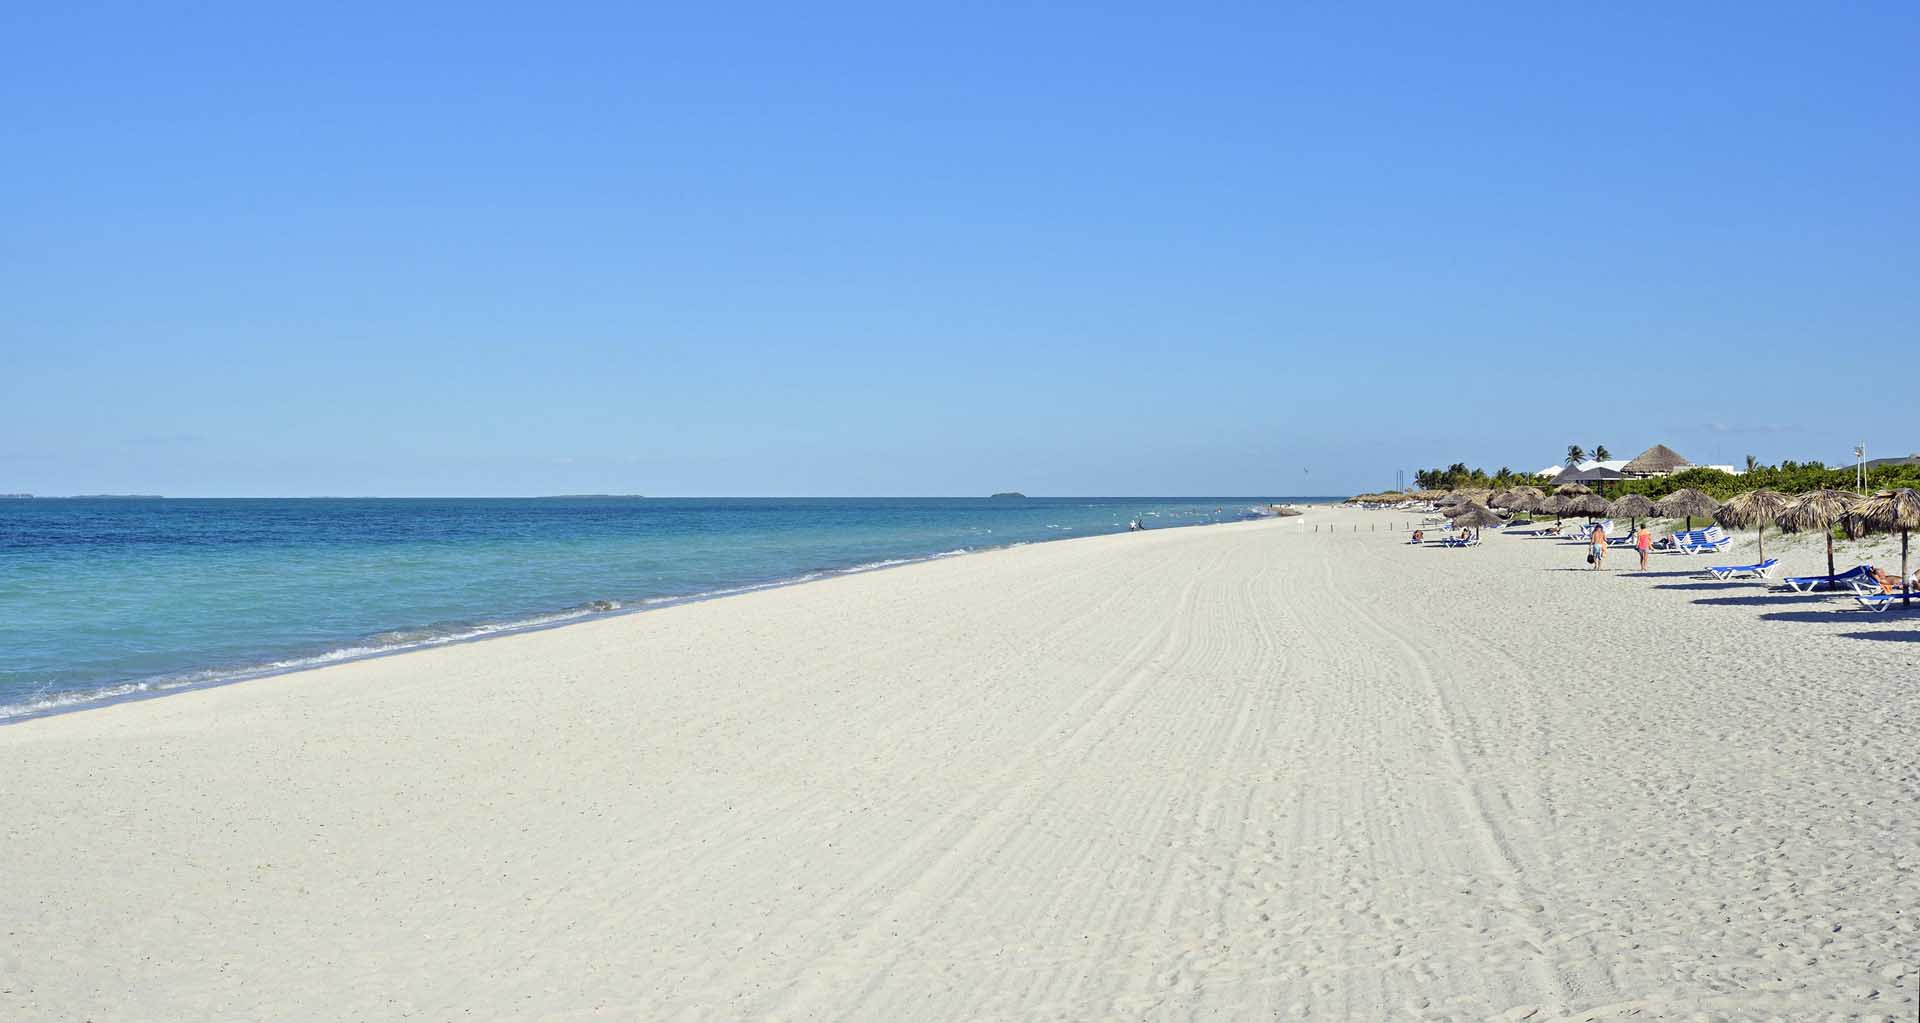 varadero plage mer cuba autrement 1